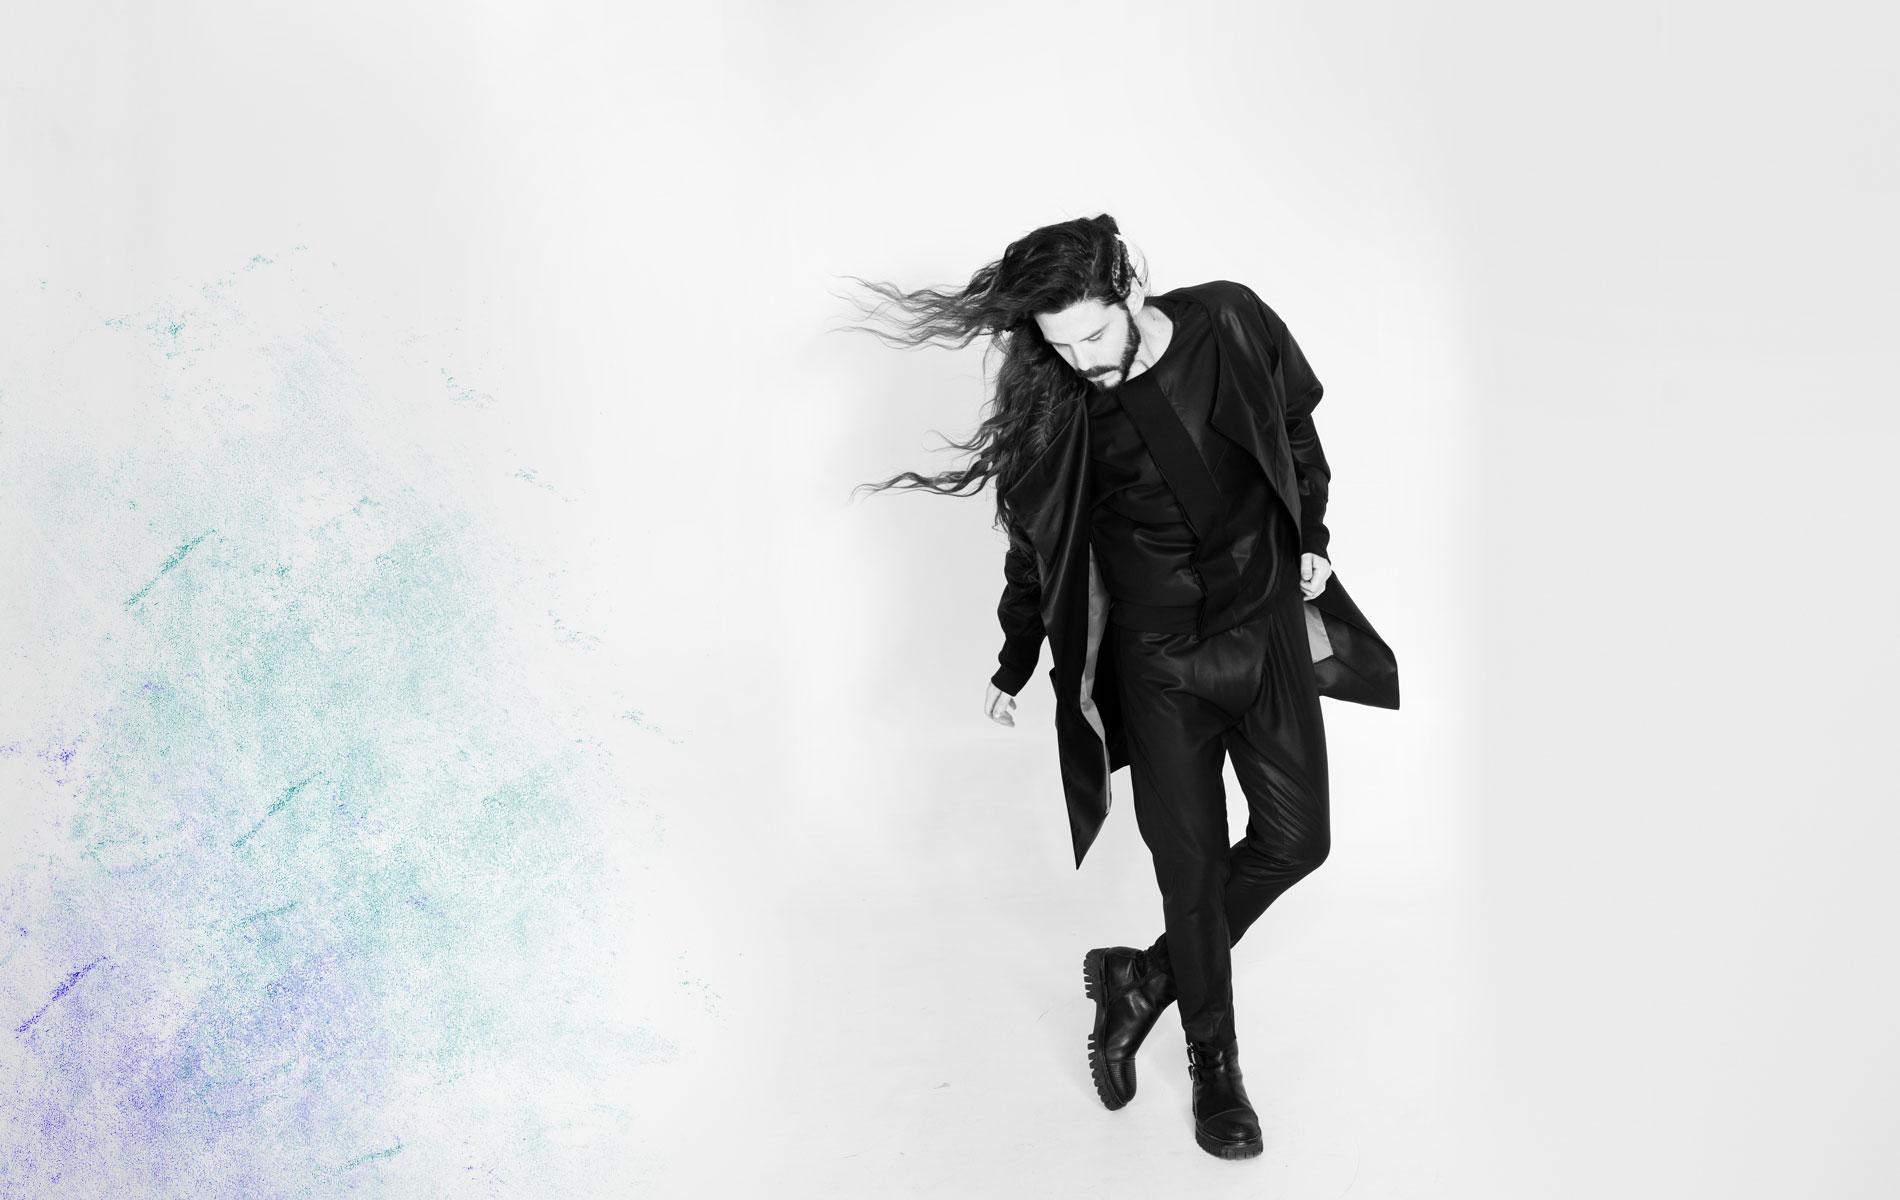 Editorial-Aleks-Kurkowski-Malefashion-Designer-Mode-High-Fashion-Avantgarde-Menswear